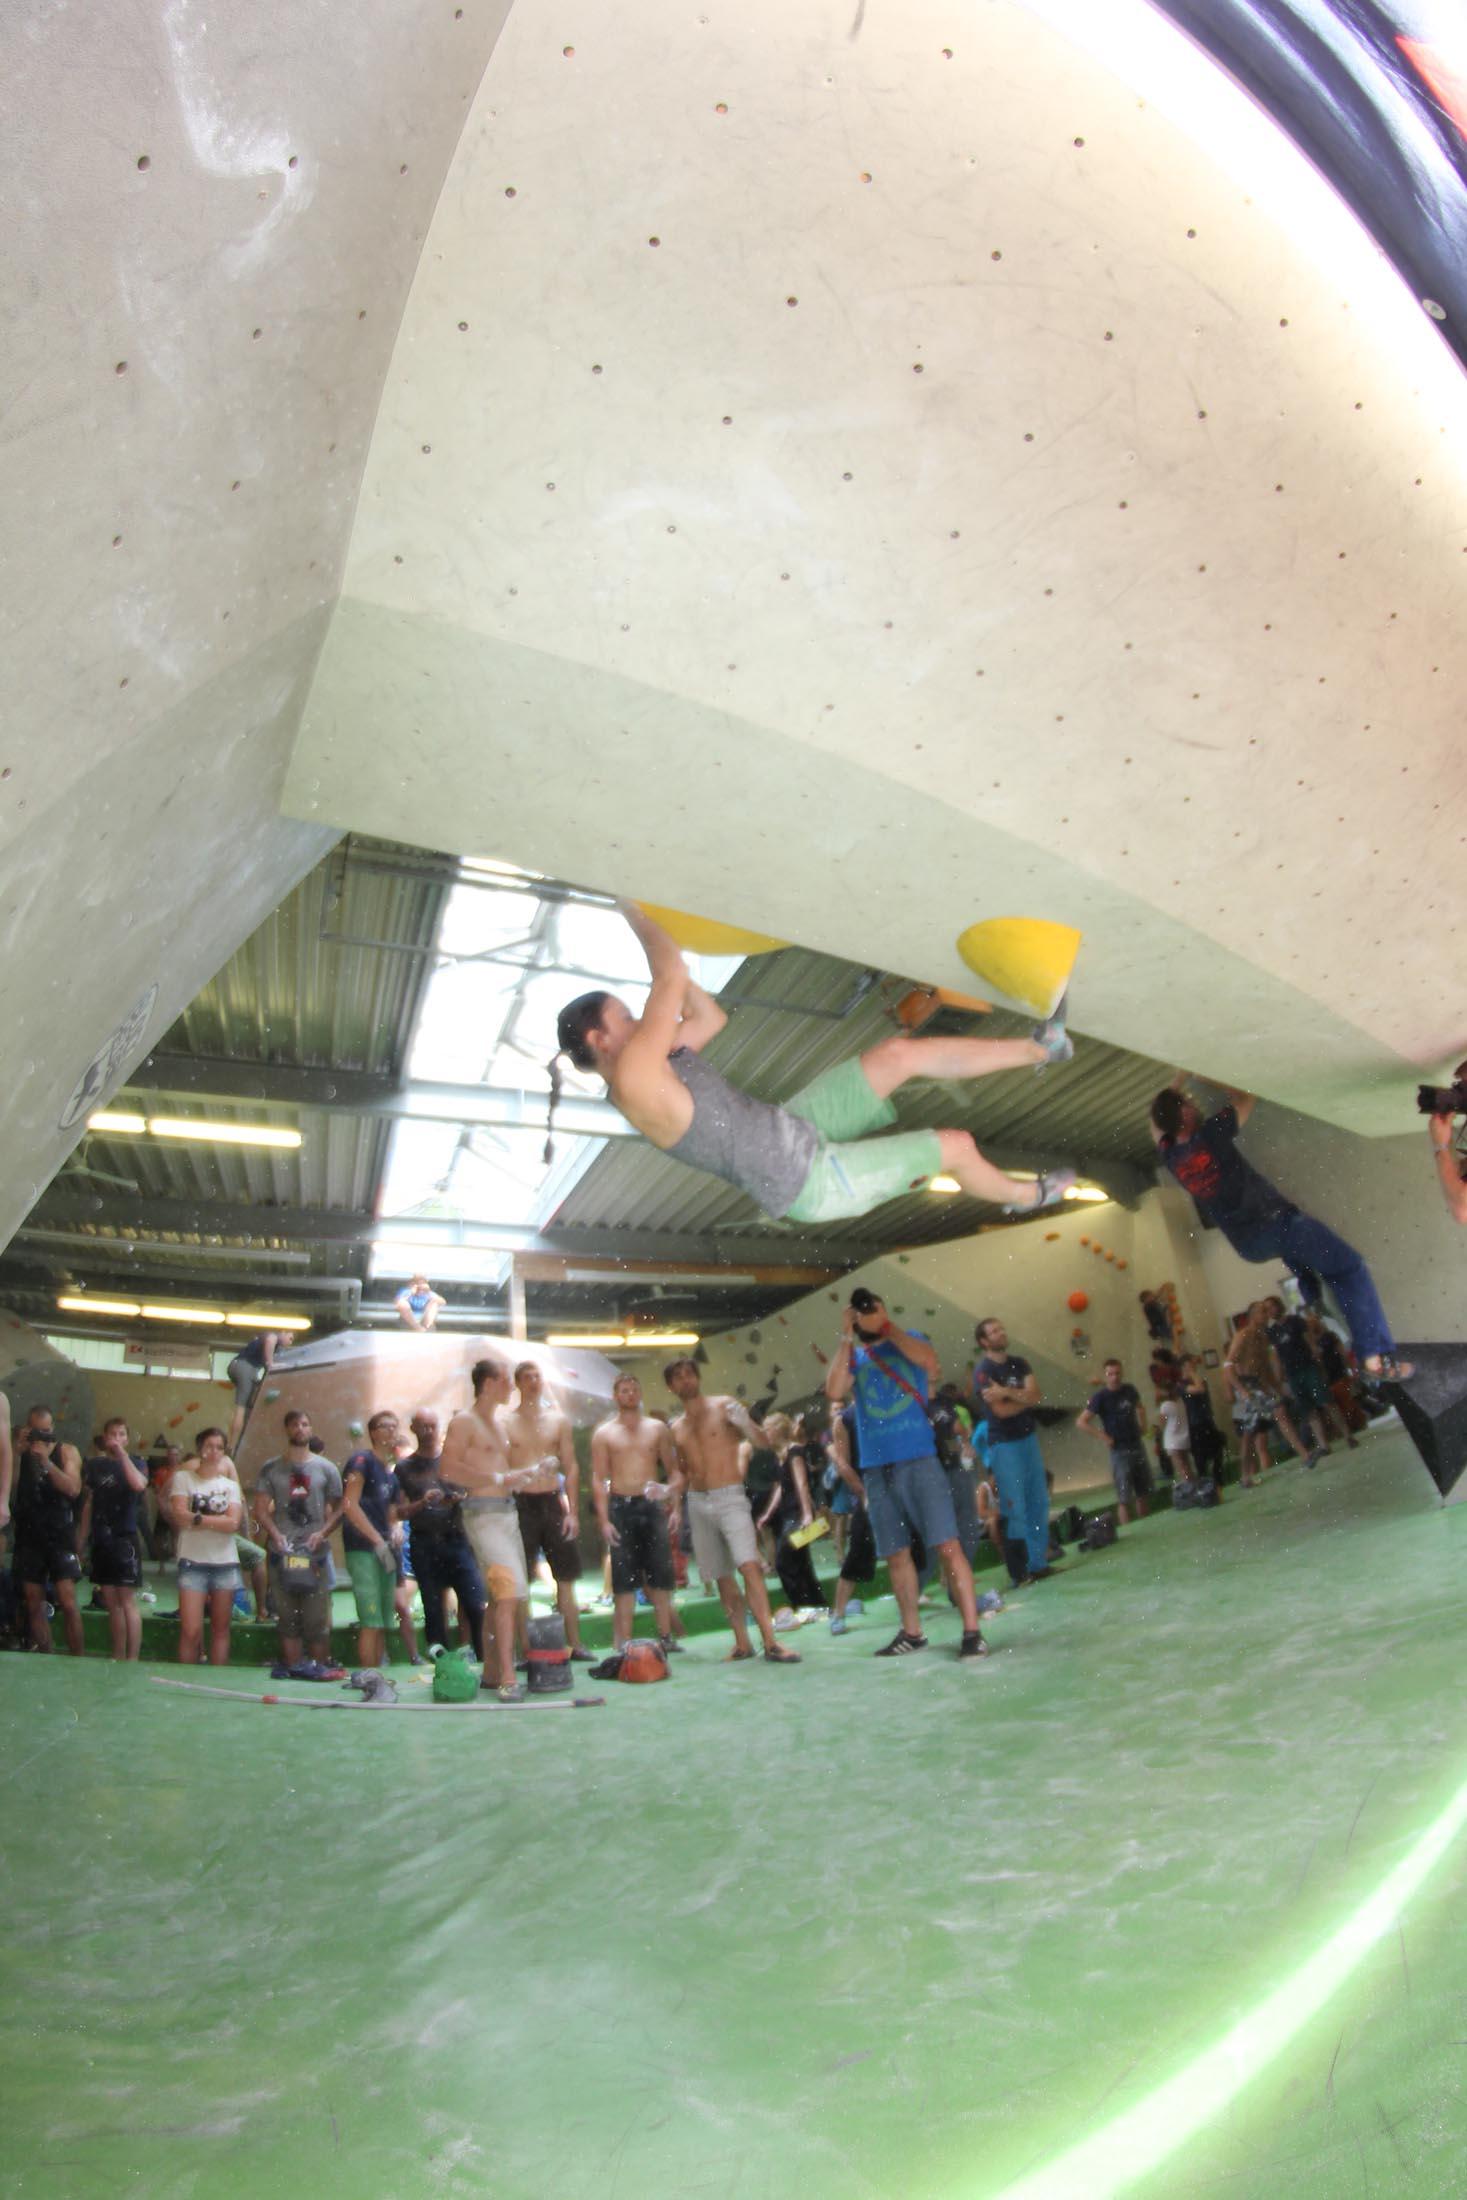 Quali, internationaler bouldercup Frankenjura 2016, BLOCKHELDEN Erlangen, Mammut, Bergfreunde.de, Boulderwettkampf07092016174